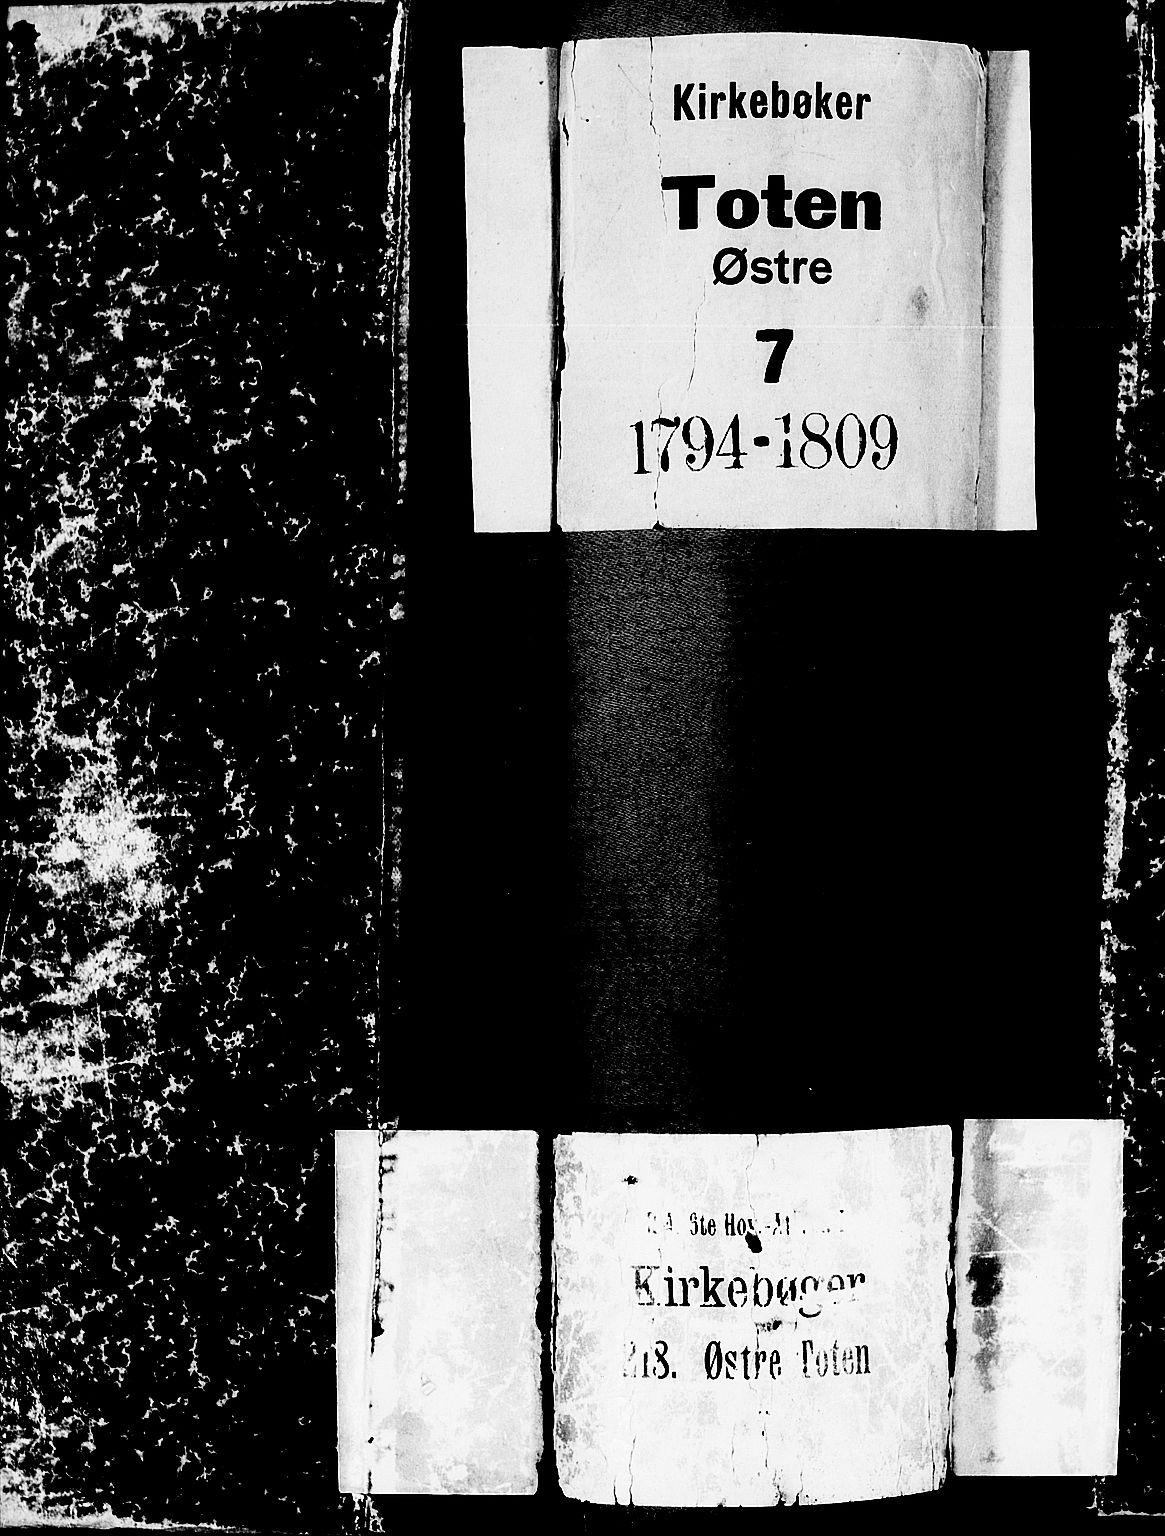 SAH, Toten prestekontor, Ministerialbok nr. 7, 1794-1809